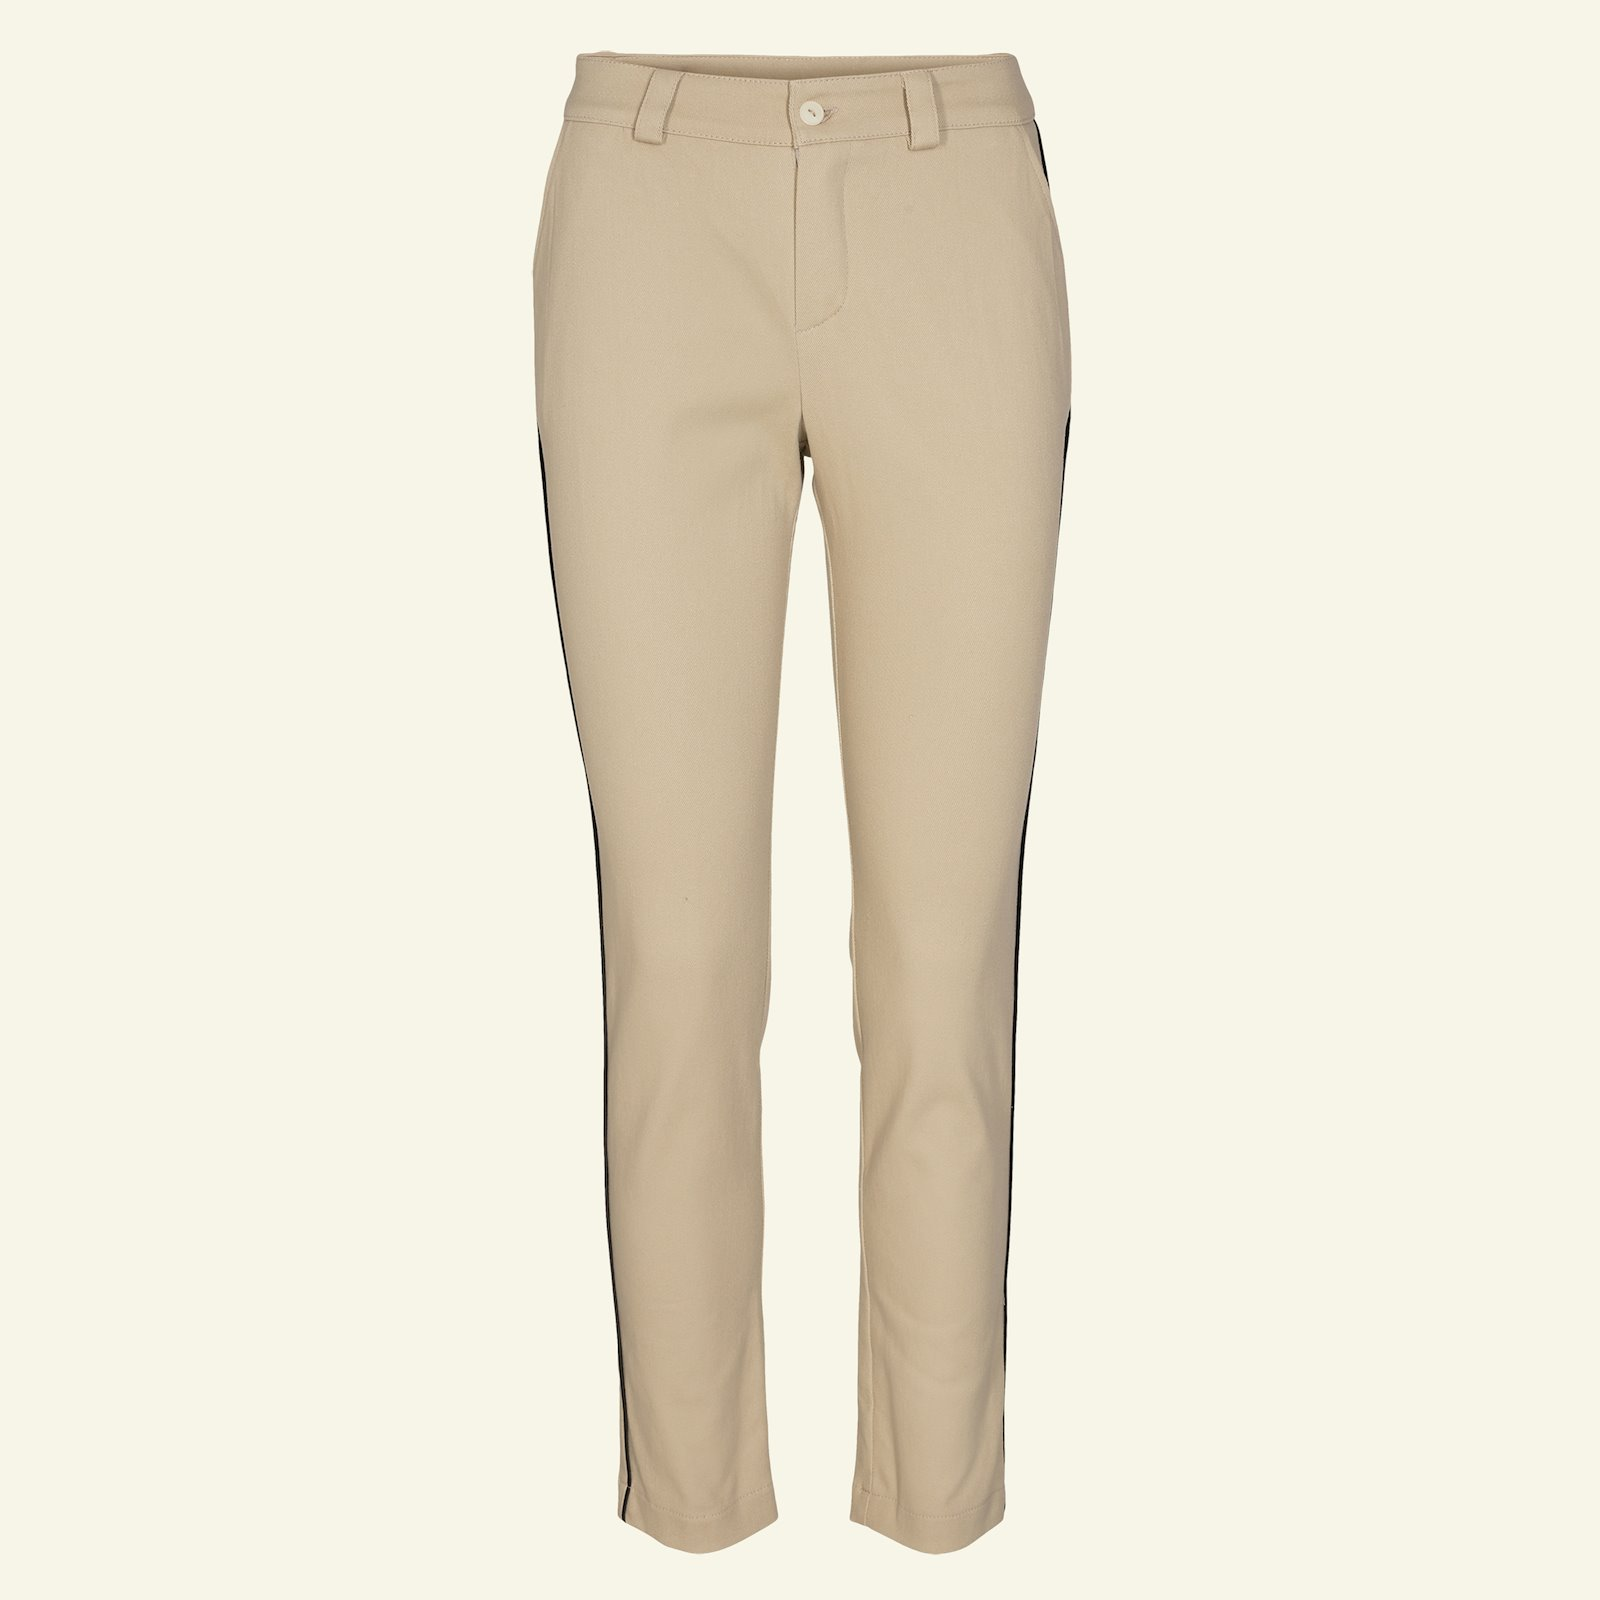 Trousers, 34/6 p20033_460842_72043_sskit